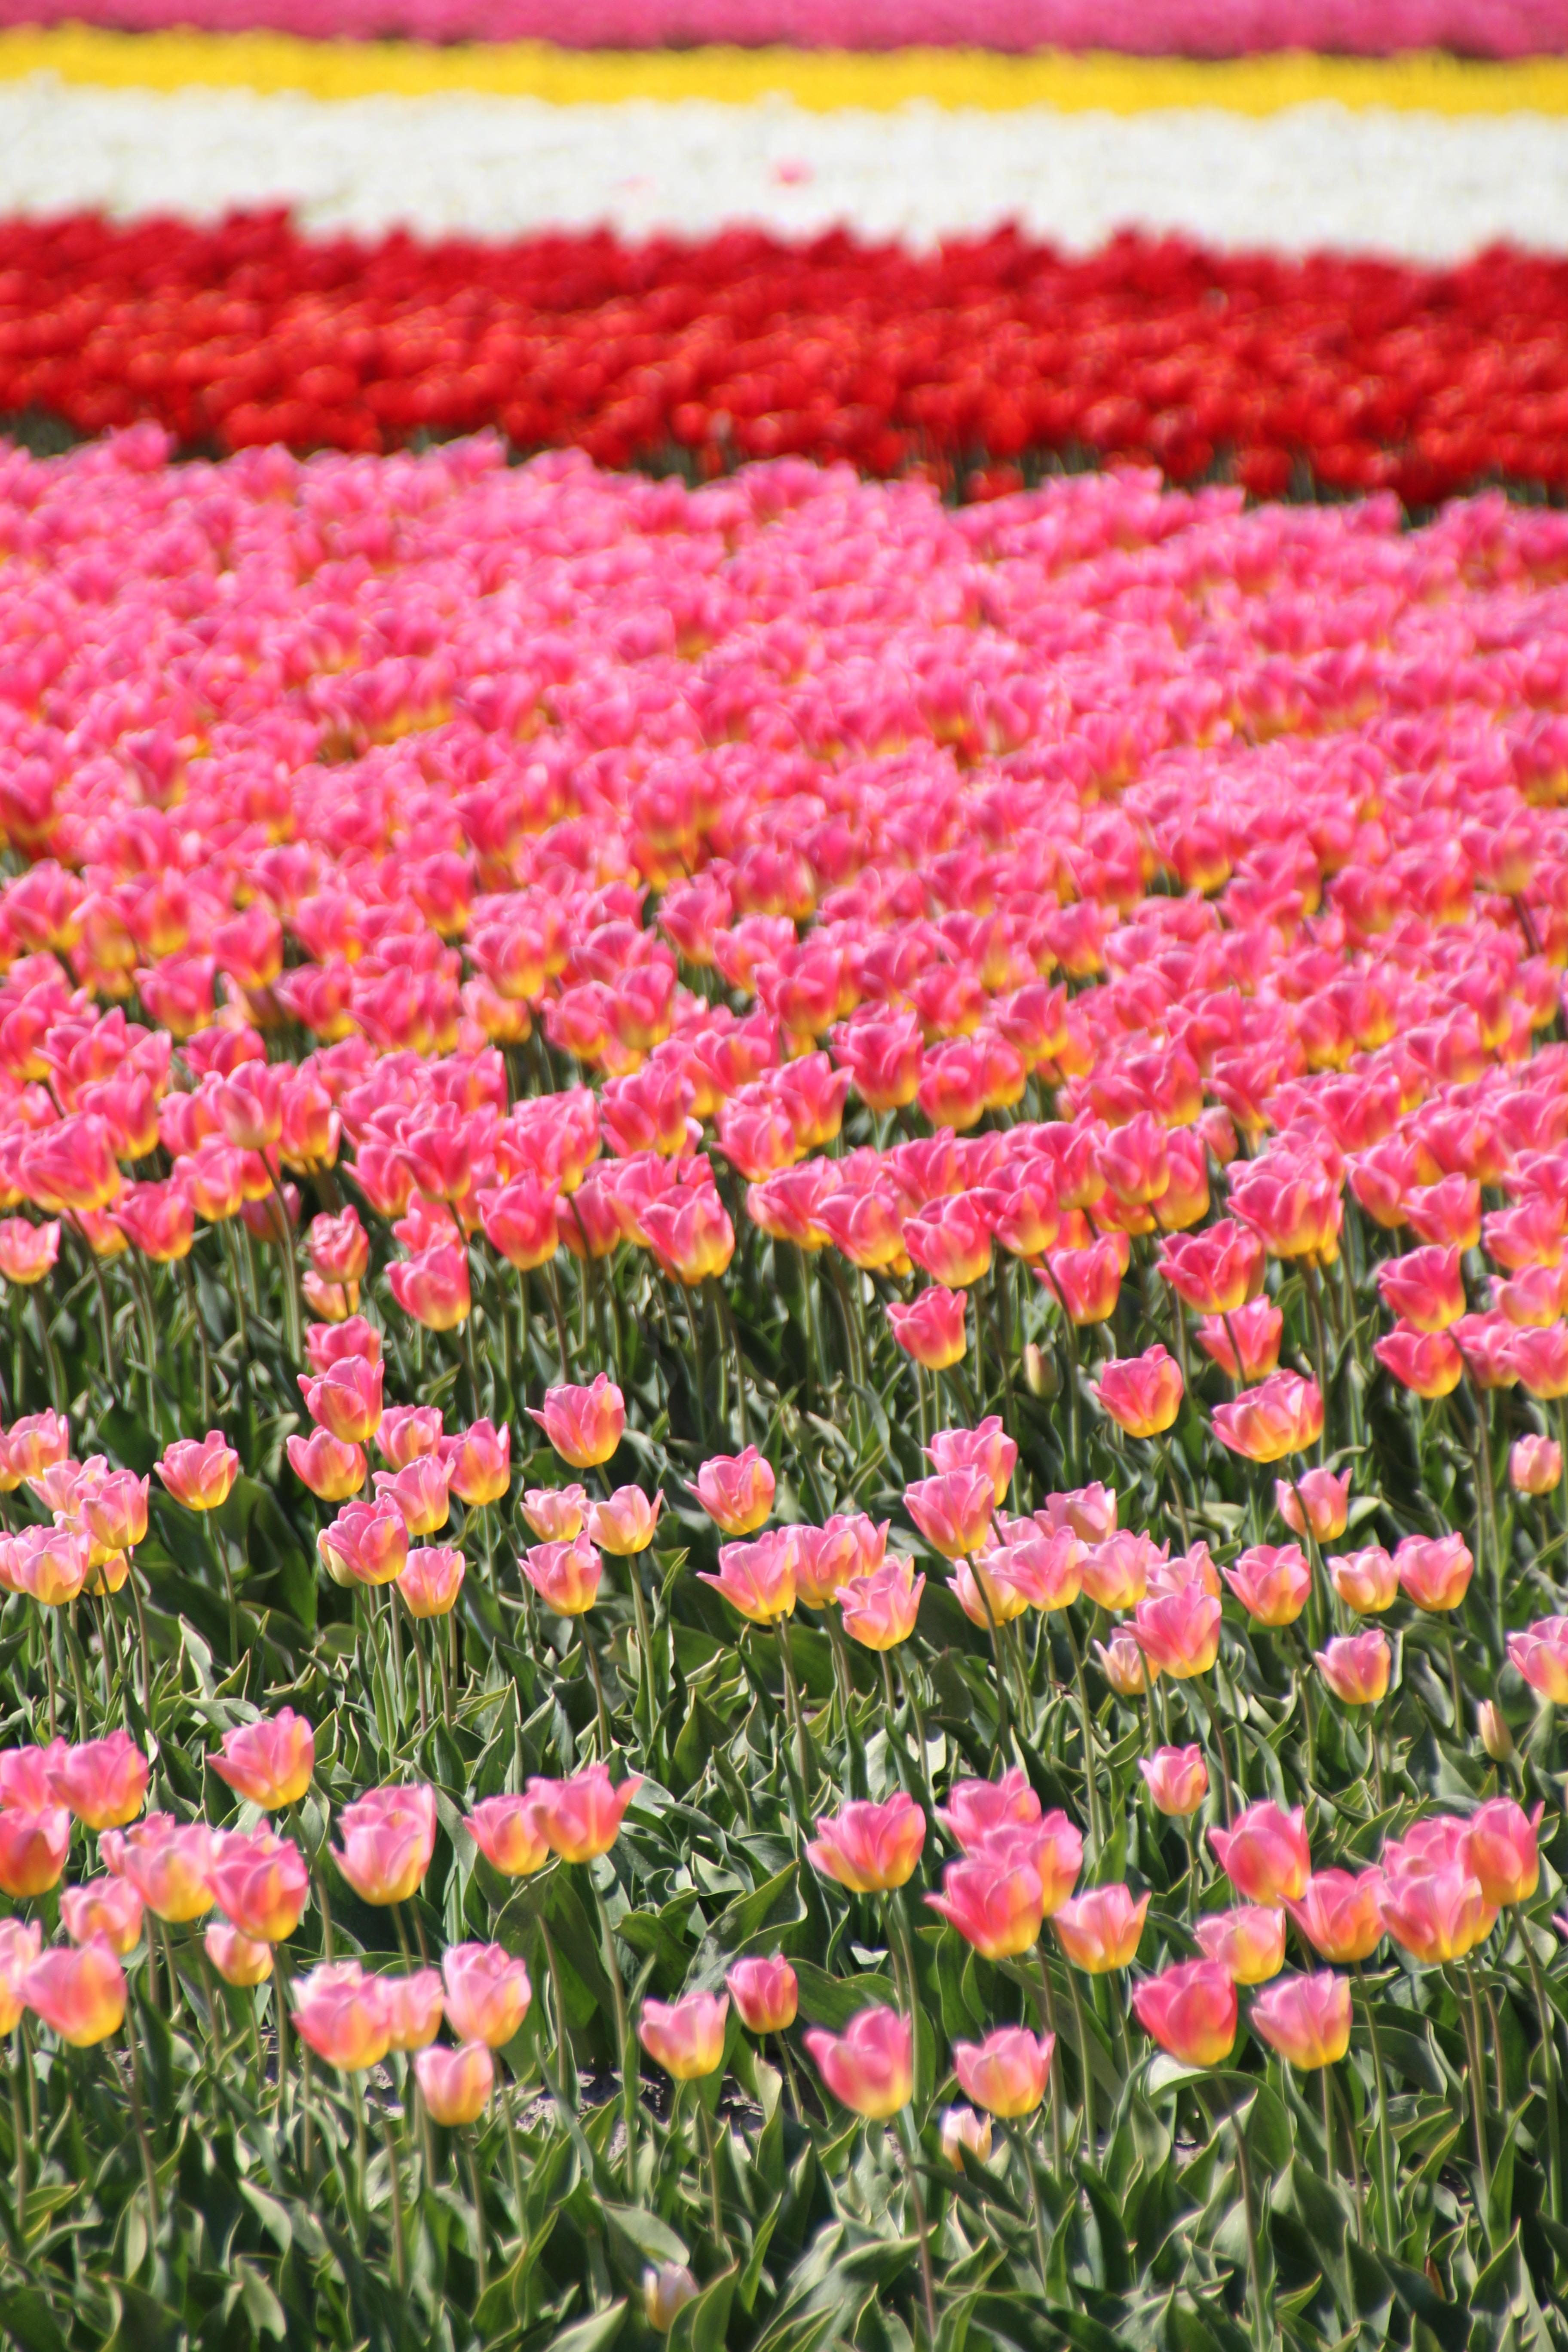 pink-petaled flowers garden